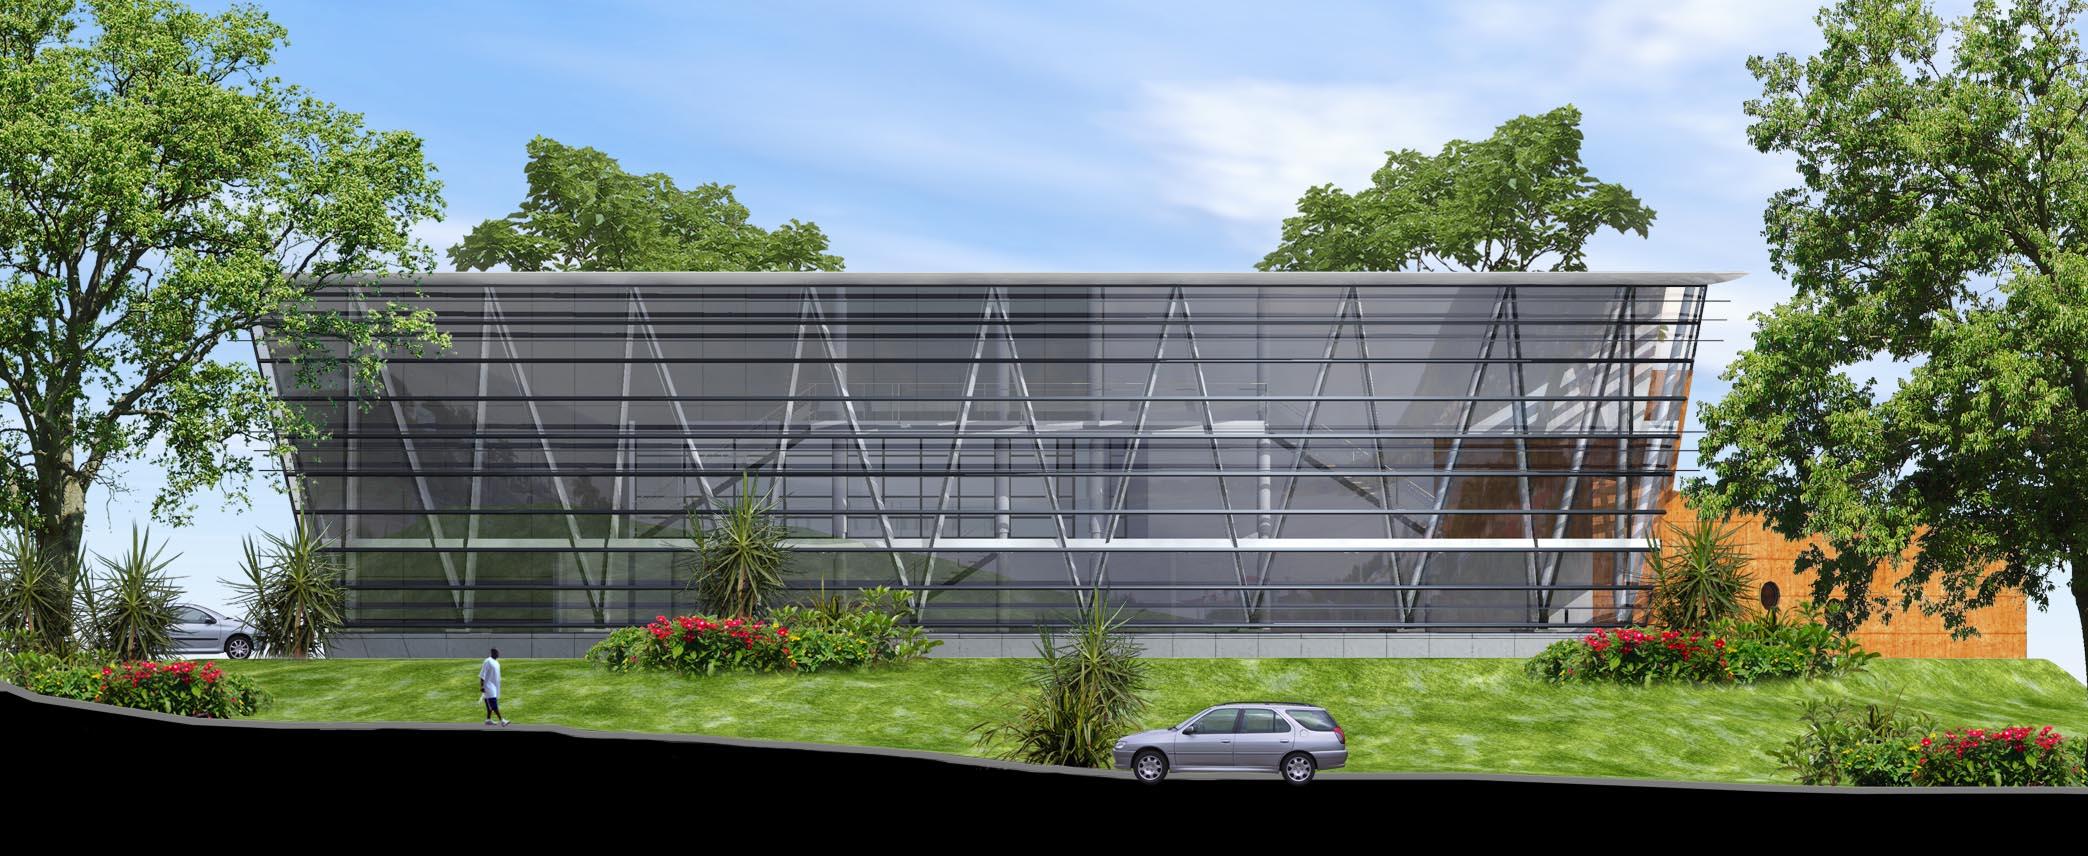 abvent 3d architecture design. Black Bedroom Furniture Sets. Home Design Ideas